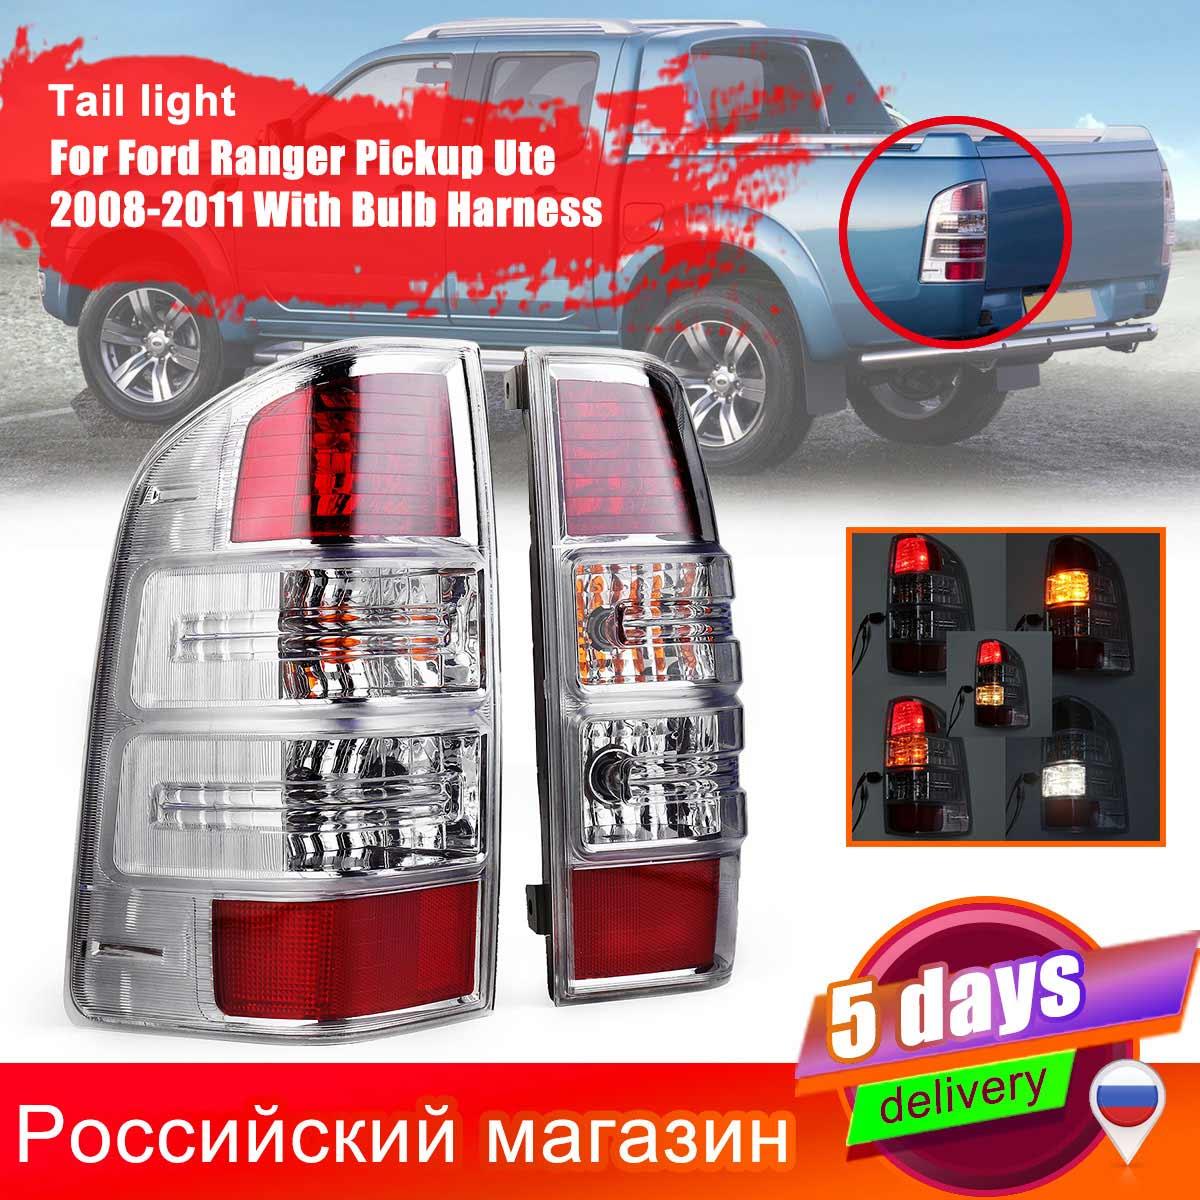 Left/Right LED Tail Light Brake Lamp For Ford Ranger Pickup Ute 2008 2009 2010 2011 With Harness Bulbs Tail Light Assembly